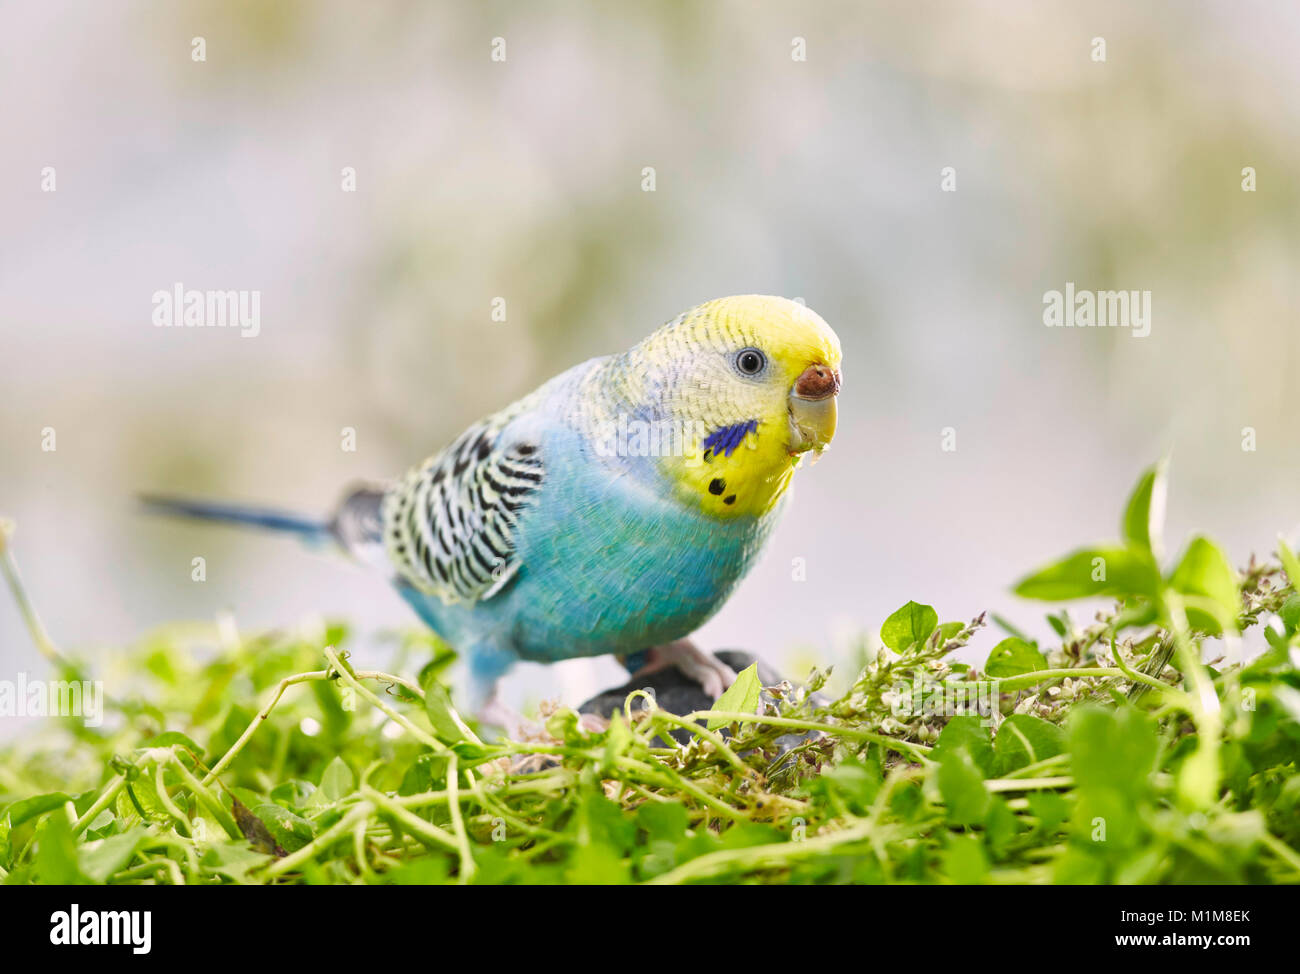 Rainbow Budgerigar, Budgie (Melopsittacus undulatus) on Chickweed (Stellaria media), Germany - Stock Image